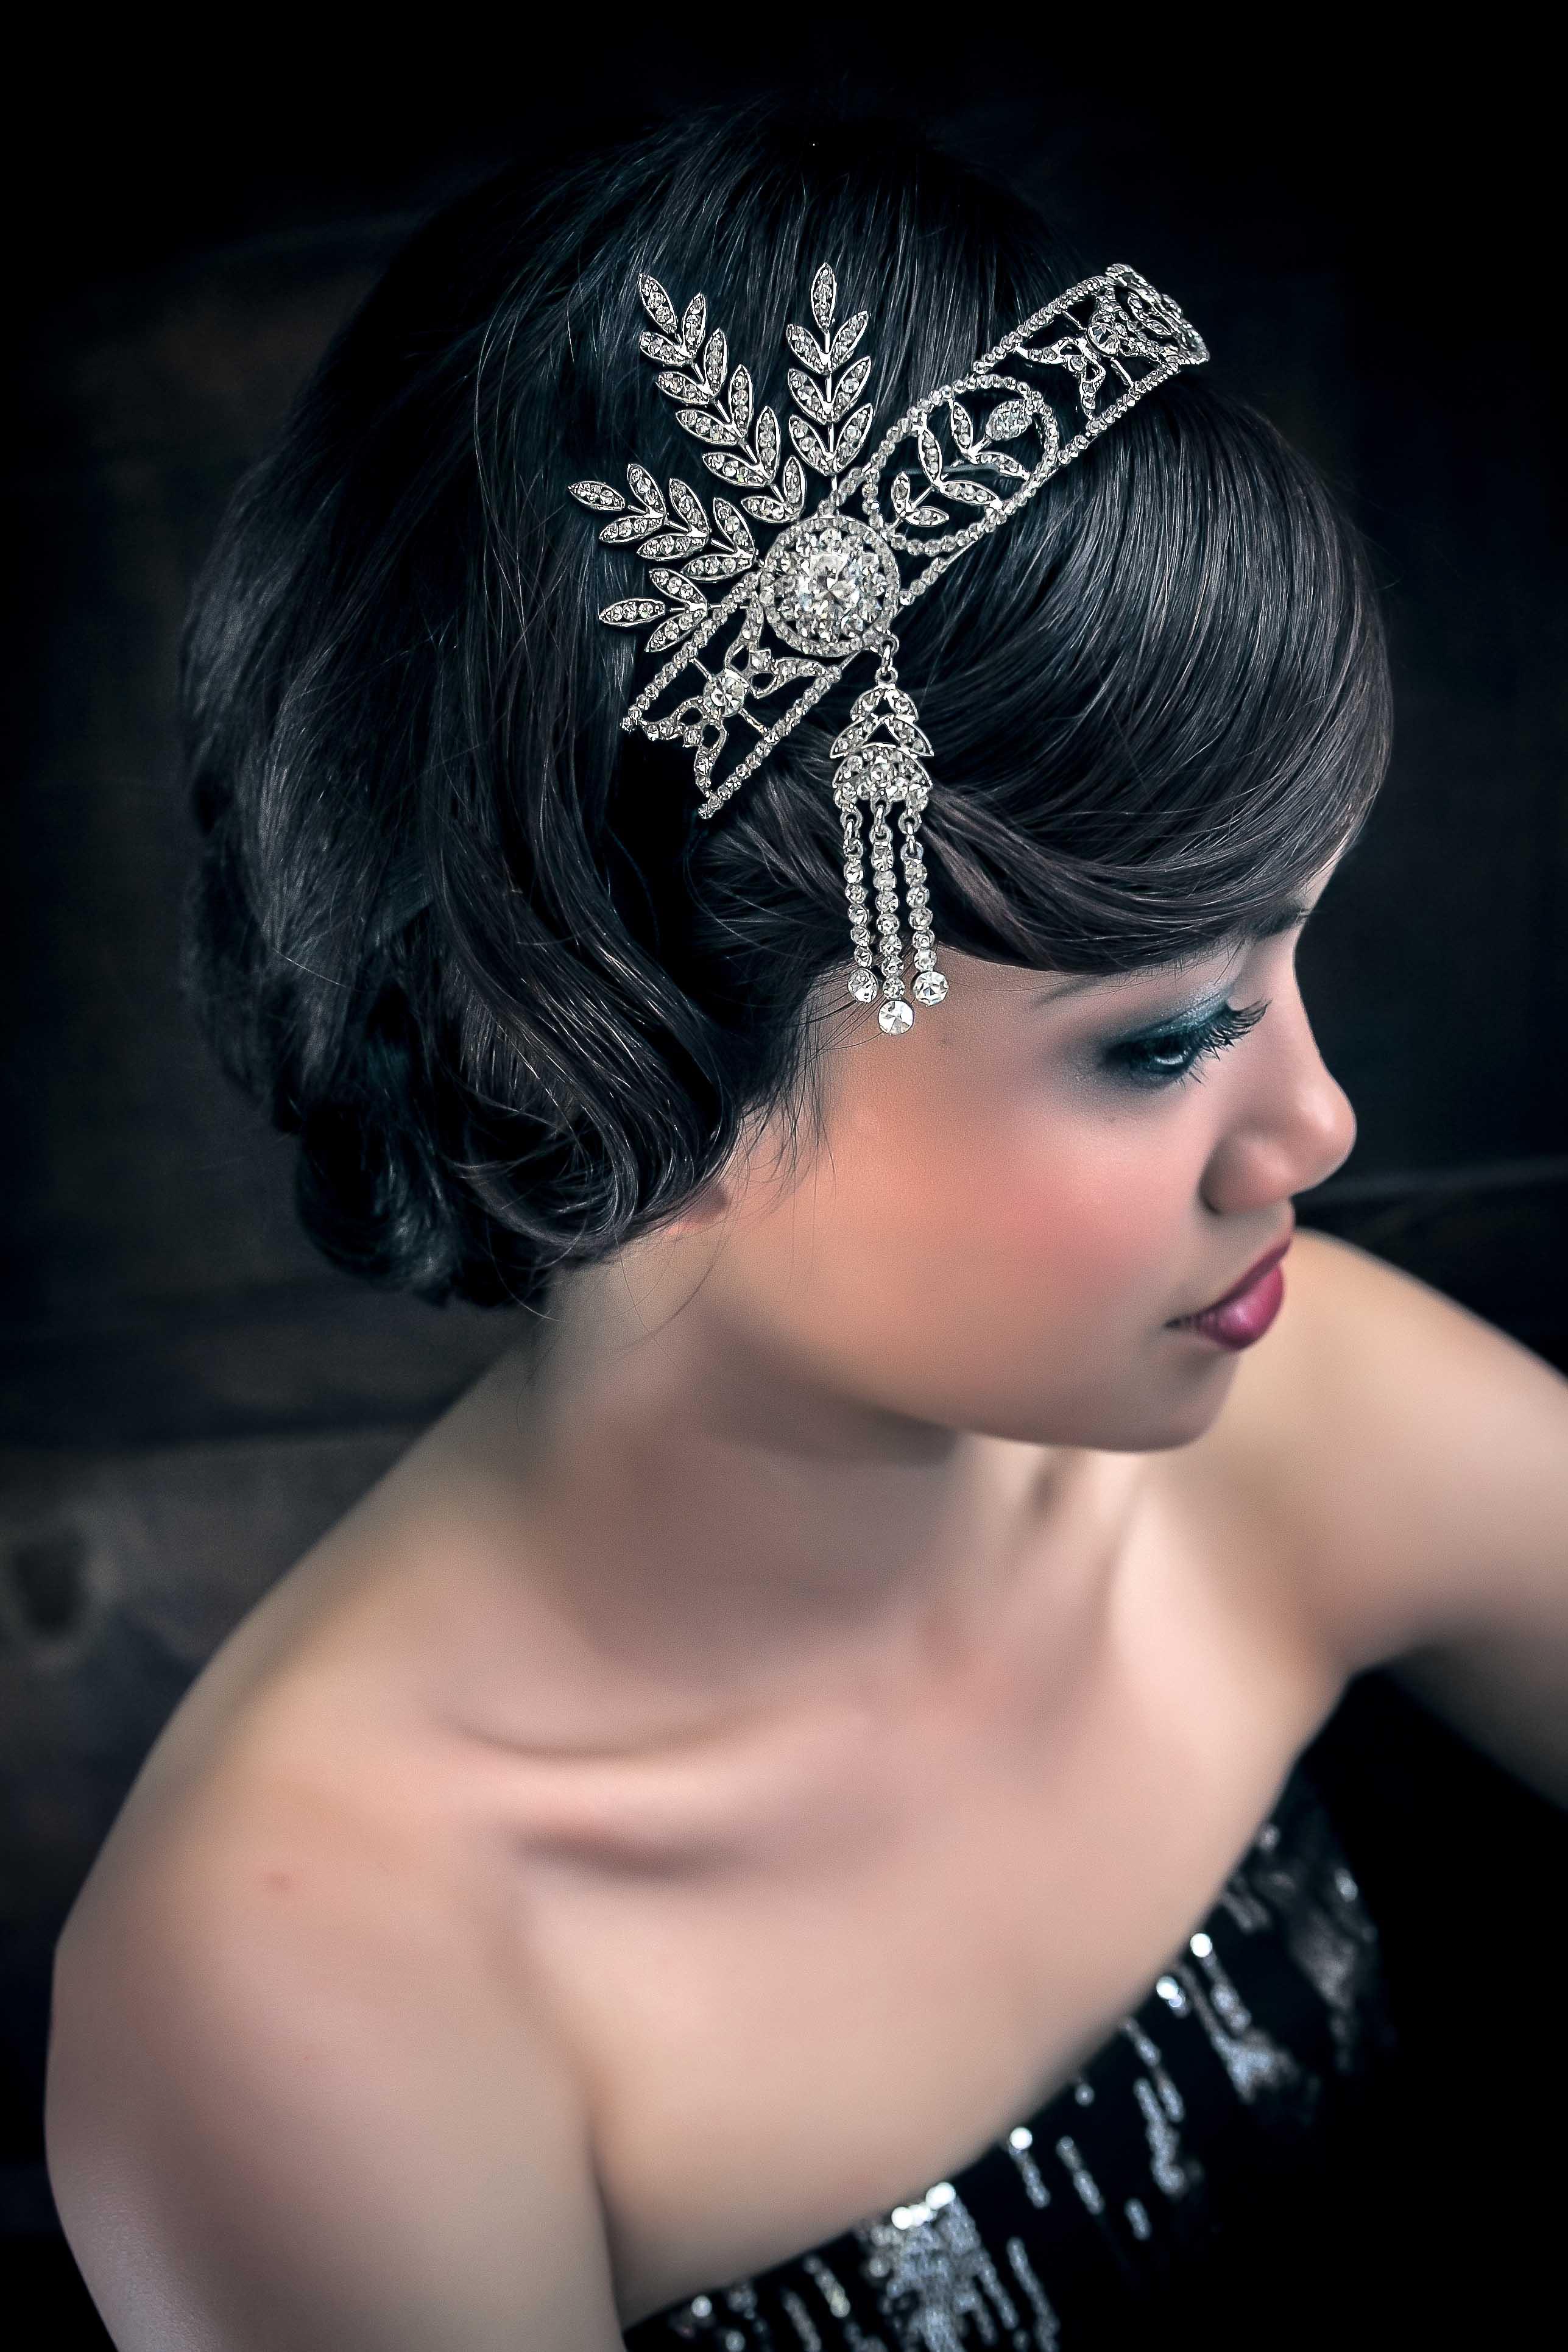 1920's是一次世界大戰後 人們最懷念的美好年代. 對於女性而言,是個服裝解放與妝容轉化的年代, 短髮與手推波造型是最為經典的, 而在此時女性喜配戴髮帶般金屬質感頭飾或者鑲有寶石及羽毛的飾品 反映出了人們在戰後,響往奢華以及自由的生活 這次的年代彩妝創作除了典雅推波的髮型與飾品外, 妝容也是根據當時的重煙燻及長細眉改變為現代感新的20's靈感妝